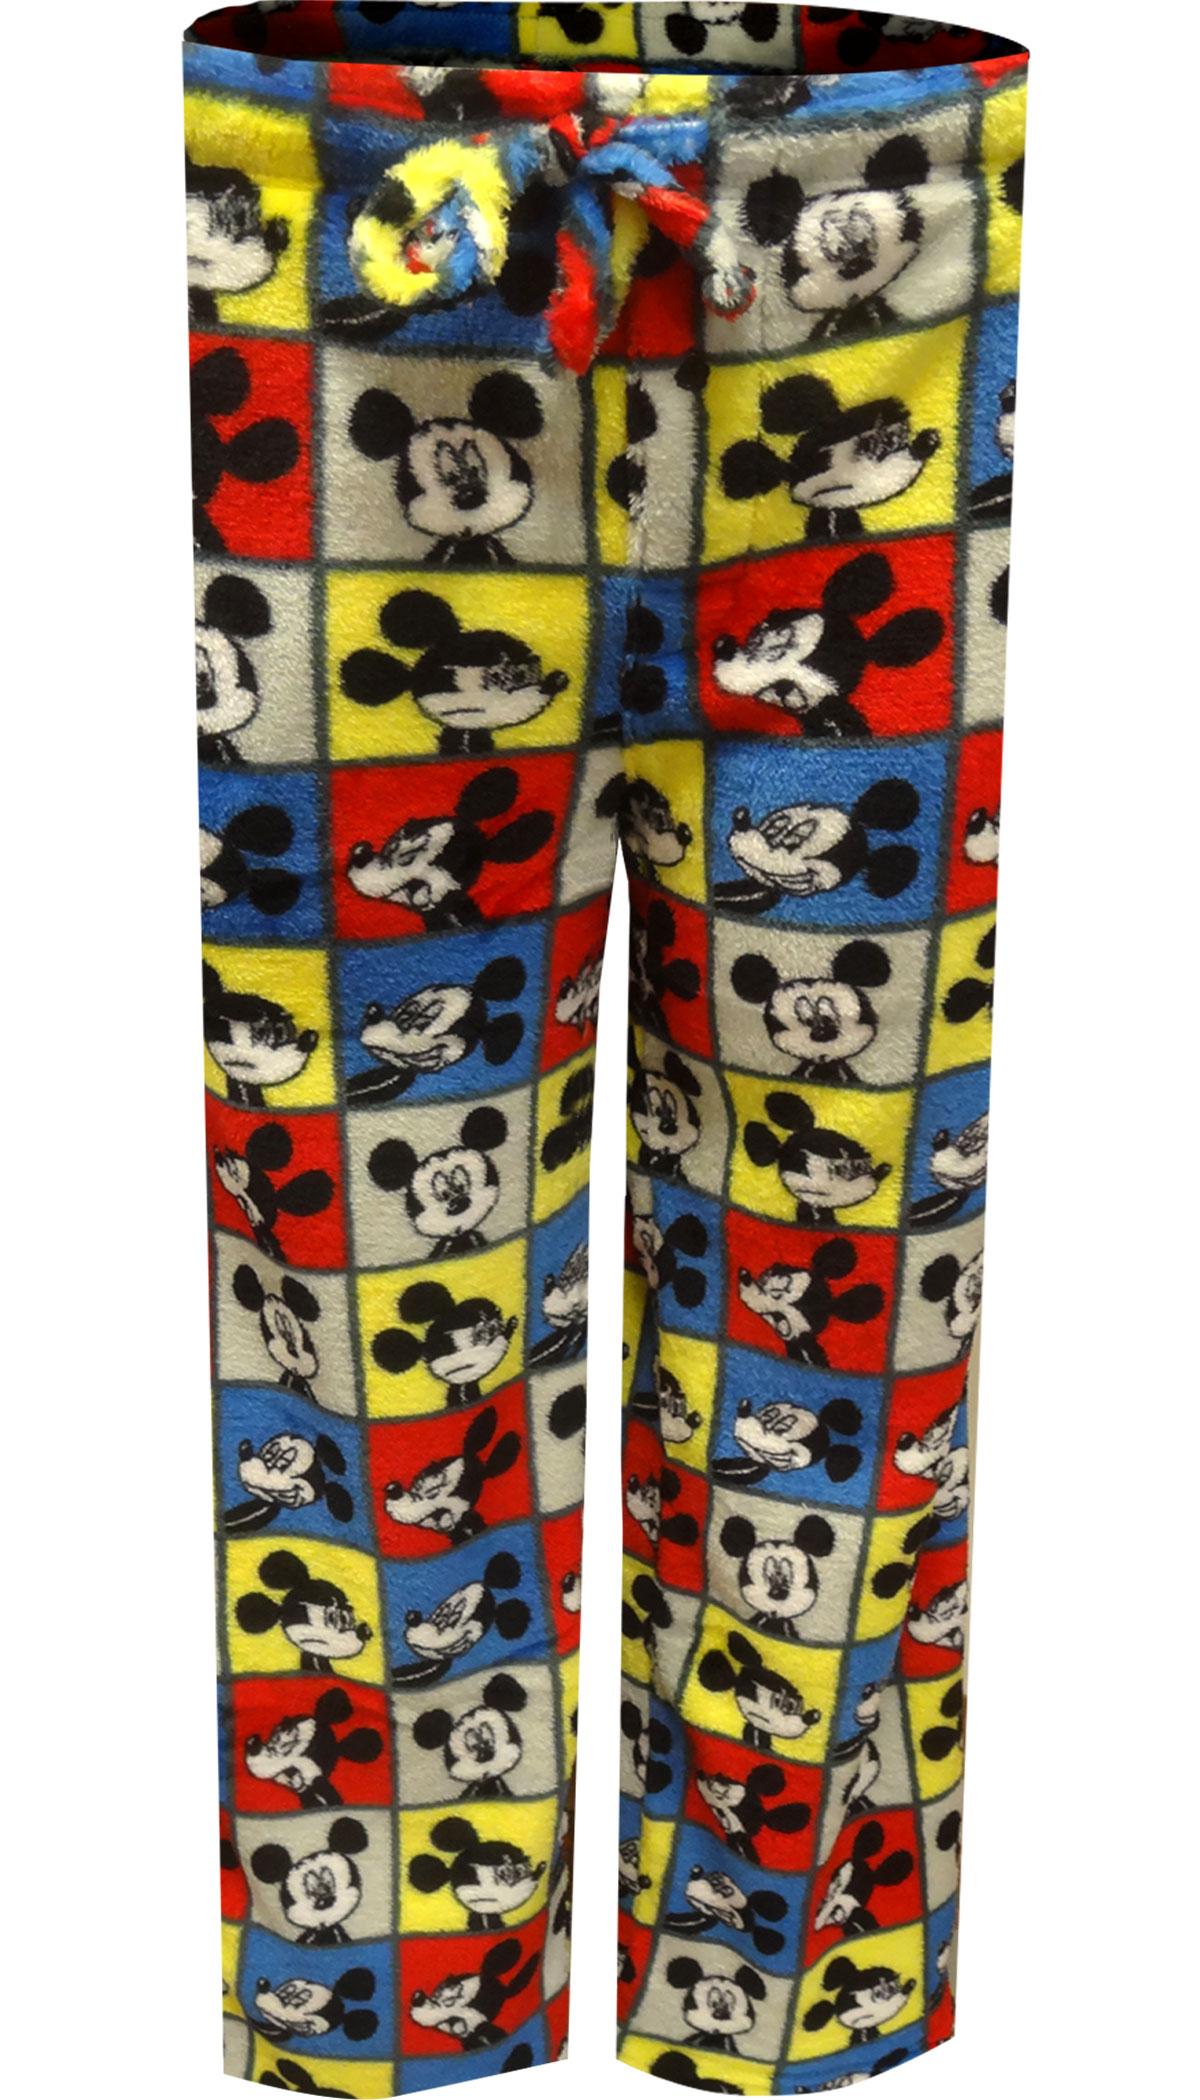 Image of Disney Mickey Mouse Plush Fleece Lounge Pants for men